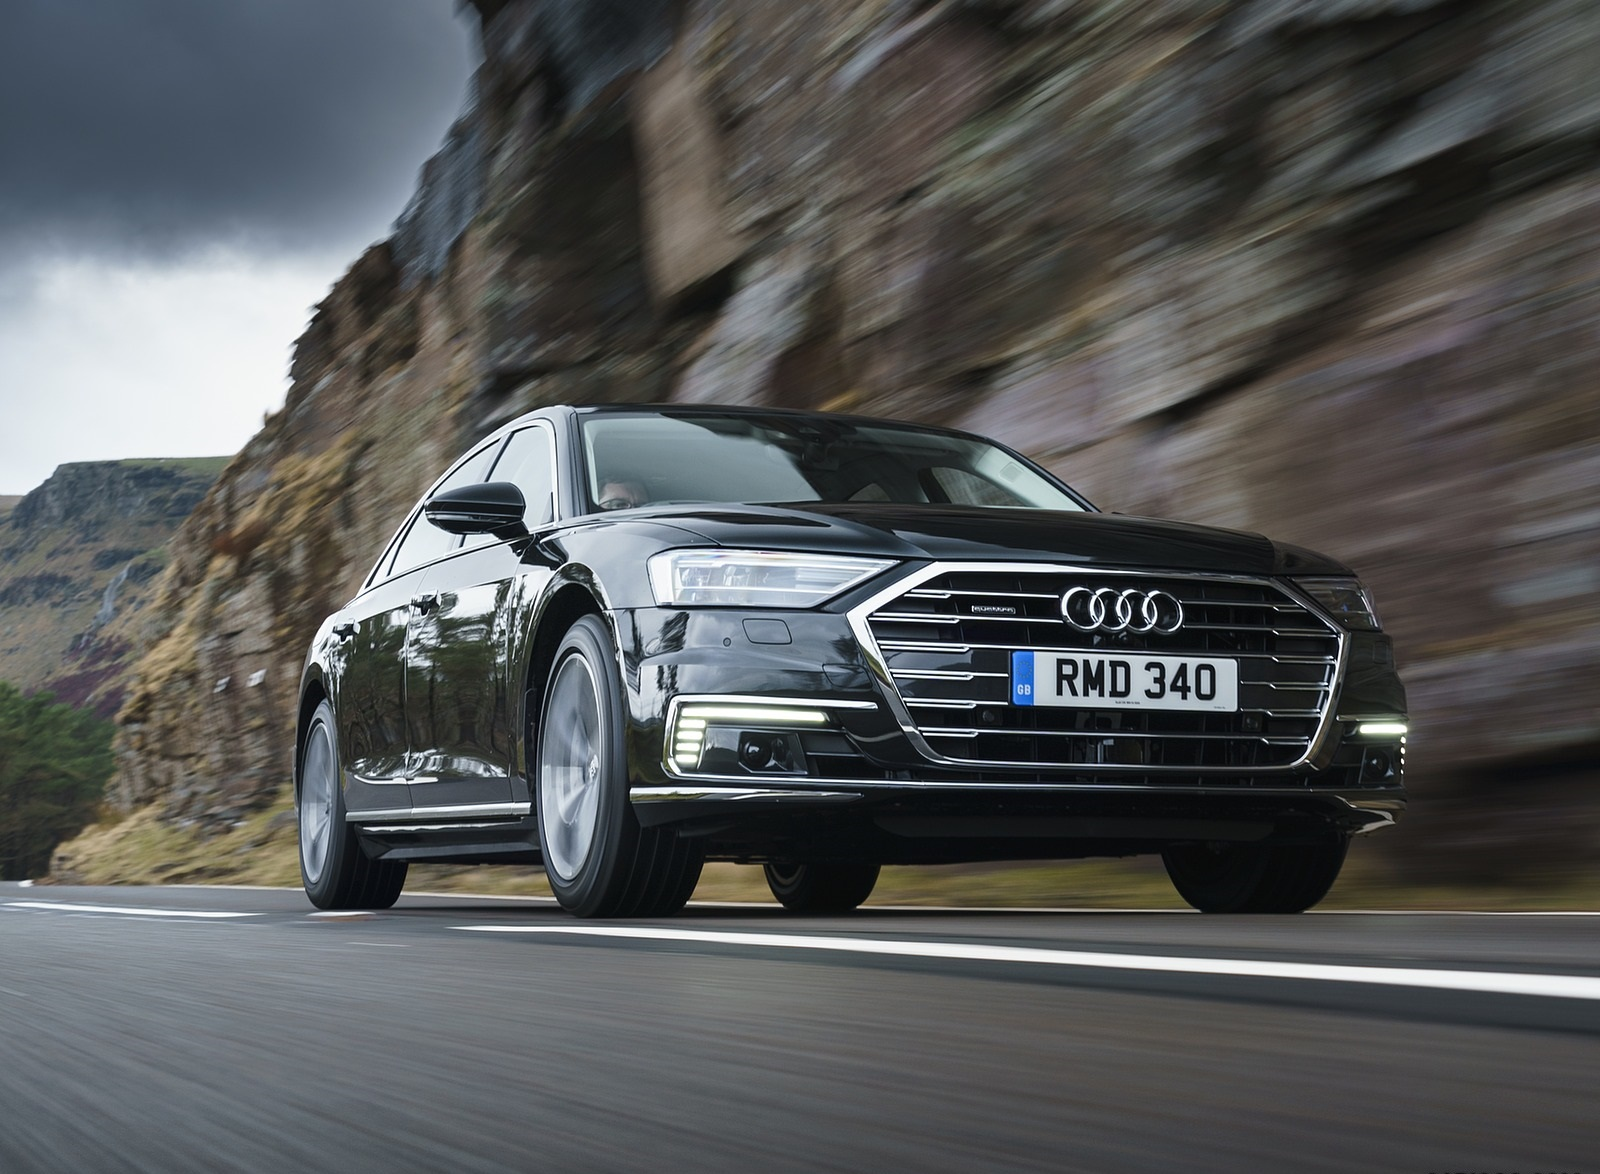 2020 Audi A8 L 60 TFSI e quattro (Plug-In Hybrid UK-Spec) Front Three-Quarter Wallpapers (6)